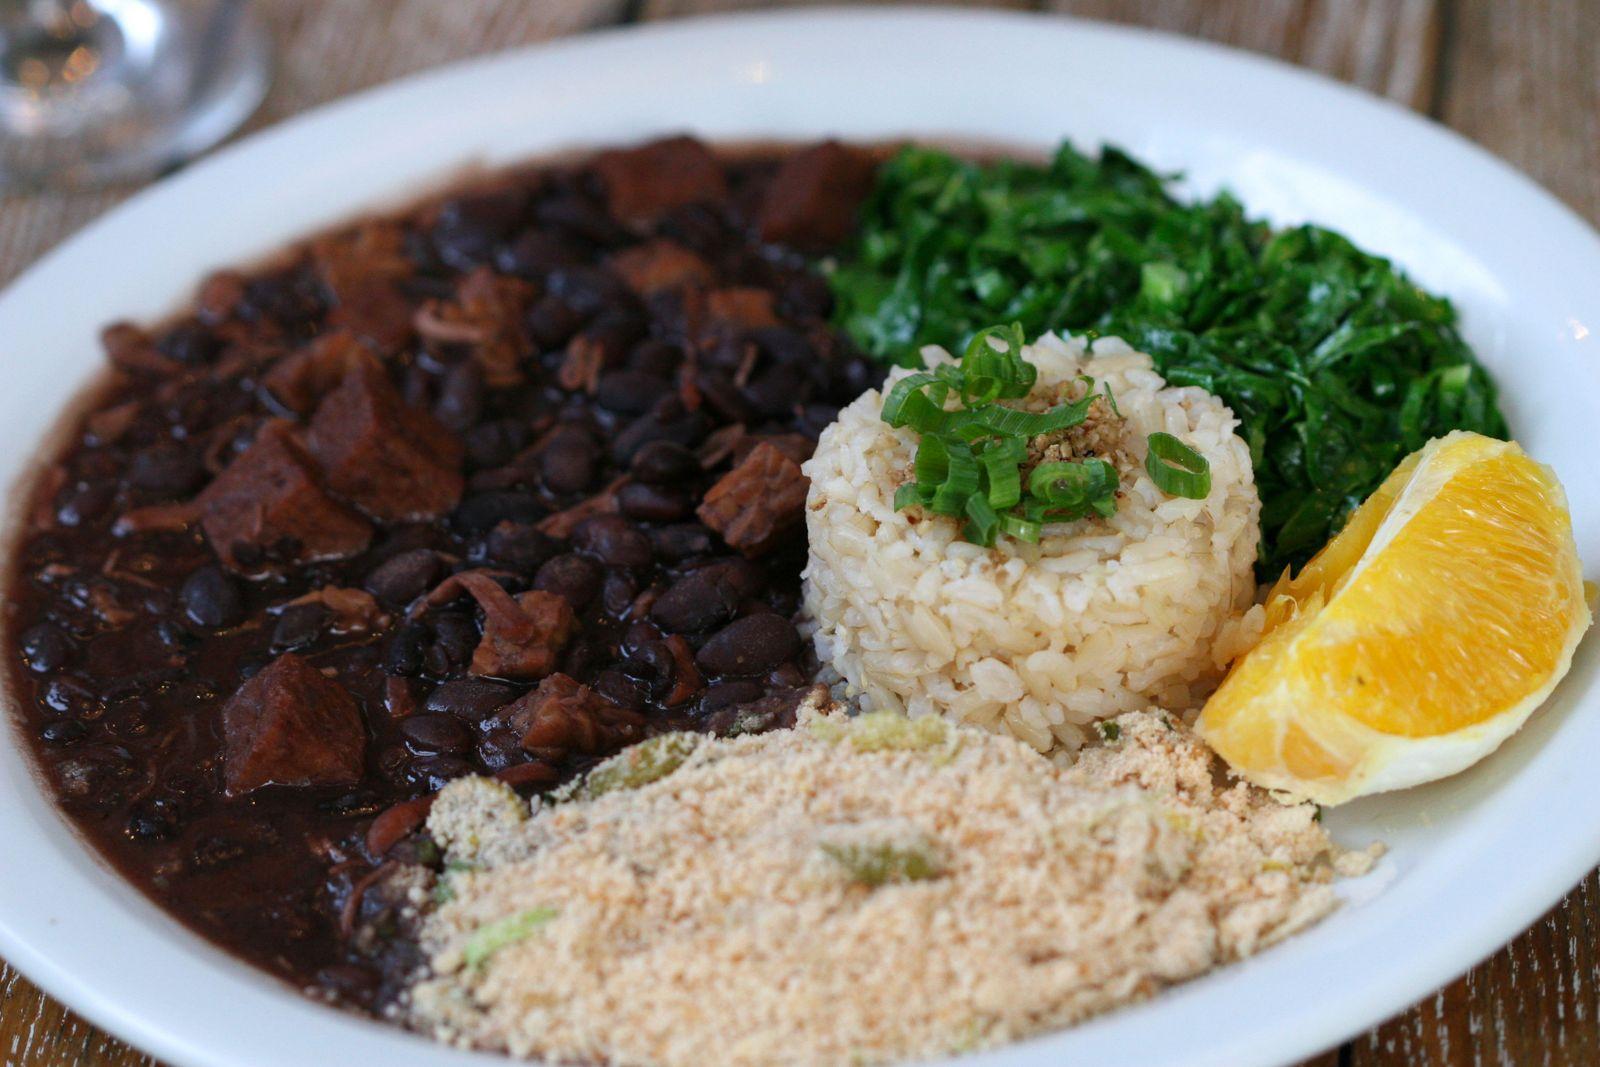 Comida tipica de Brasil | Me lo dijo Lola